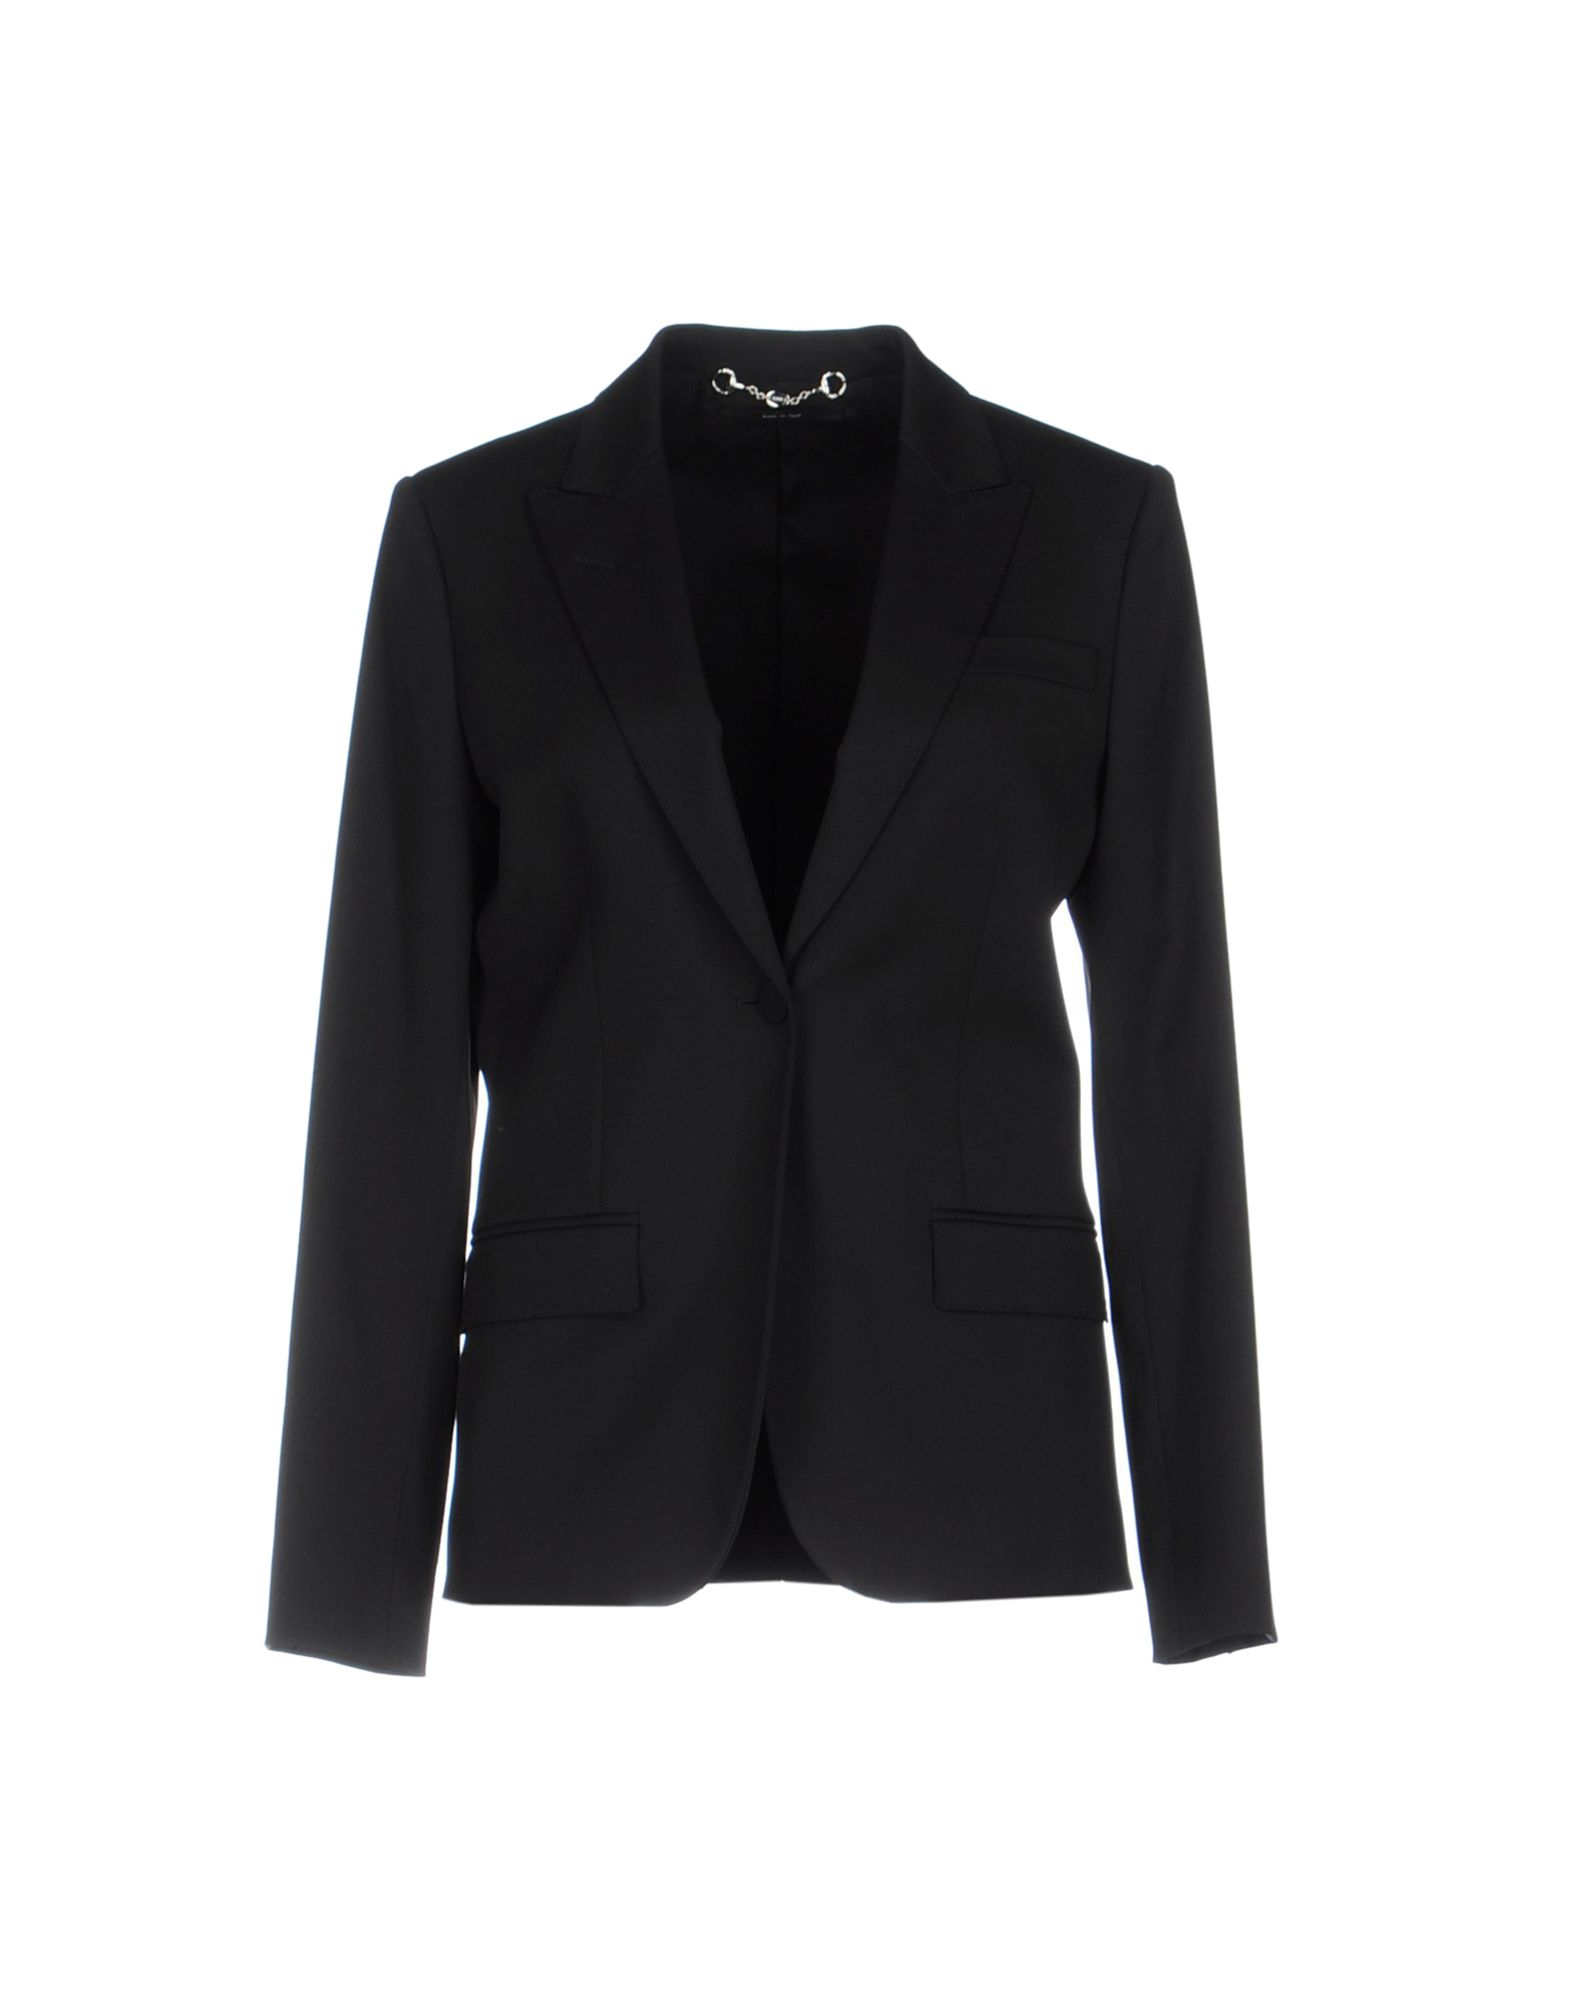 Giacca Gucci Donna - Acquista online su Zs5evb5